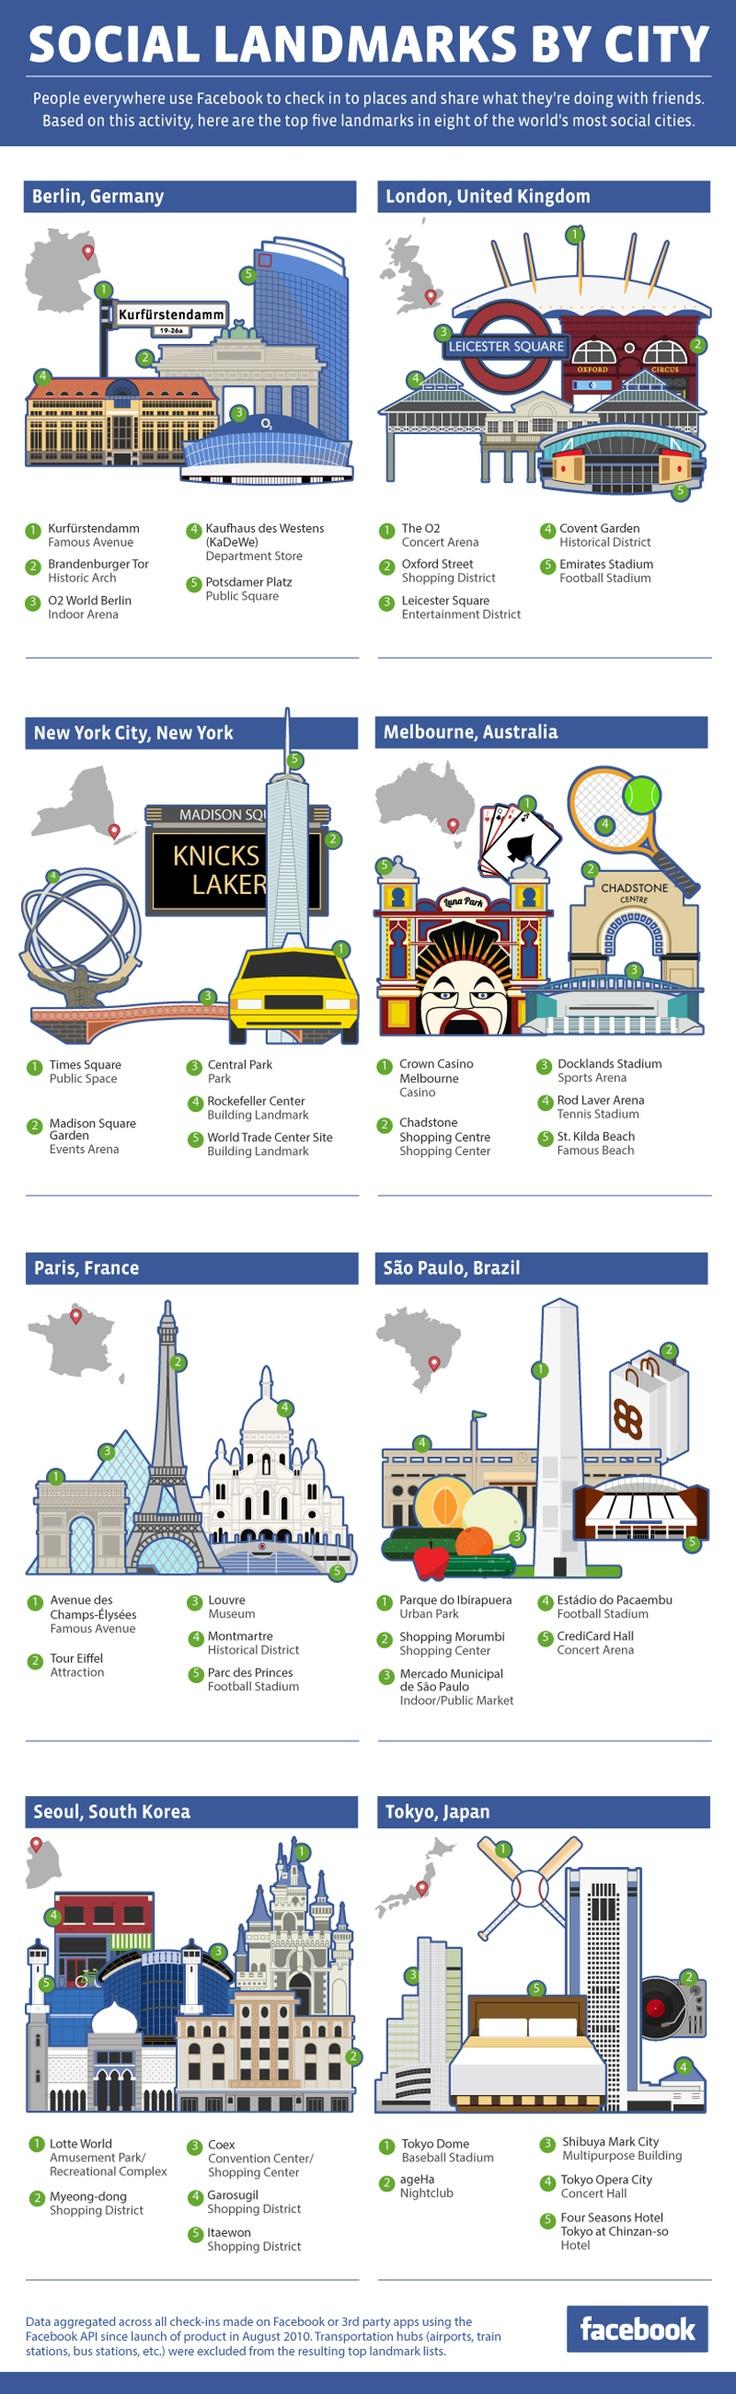 facebookcitylandmarksSocial Network, Places To Travel, Most Popular, Website, Social Media, Social Landmarks, Check In, Infographic, Socialmedia